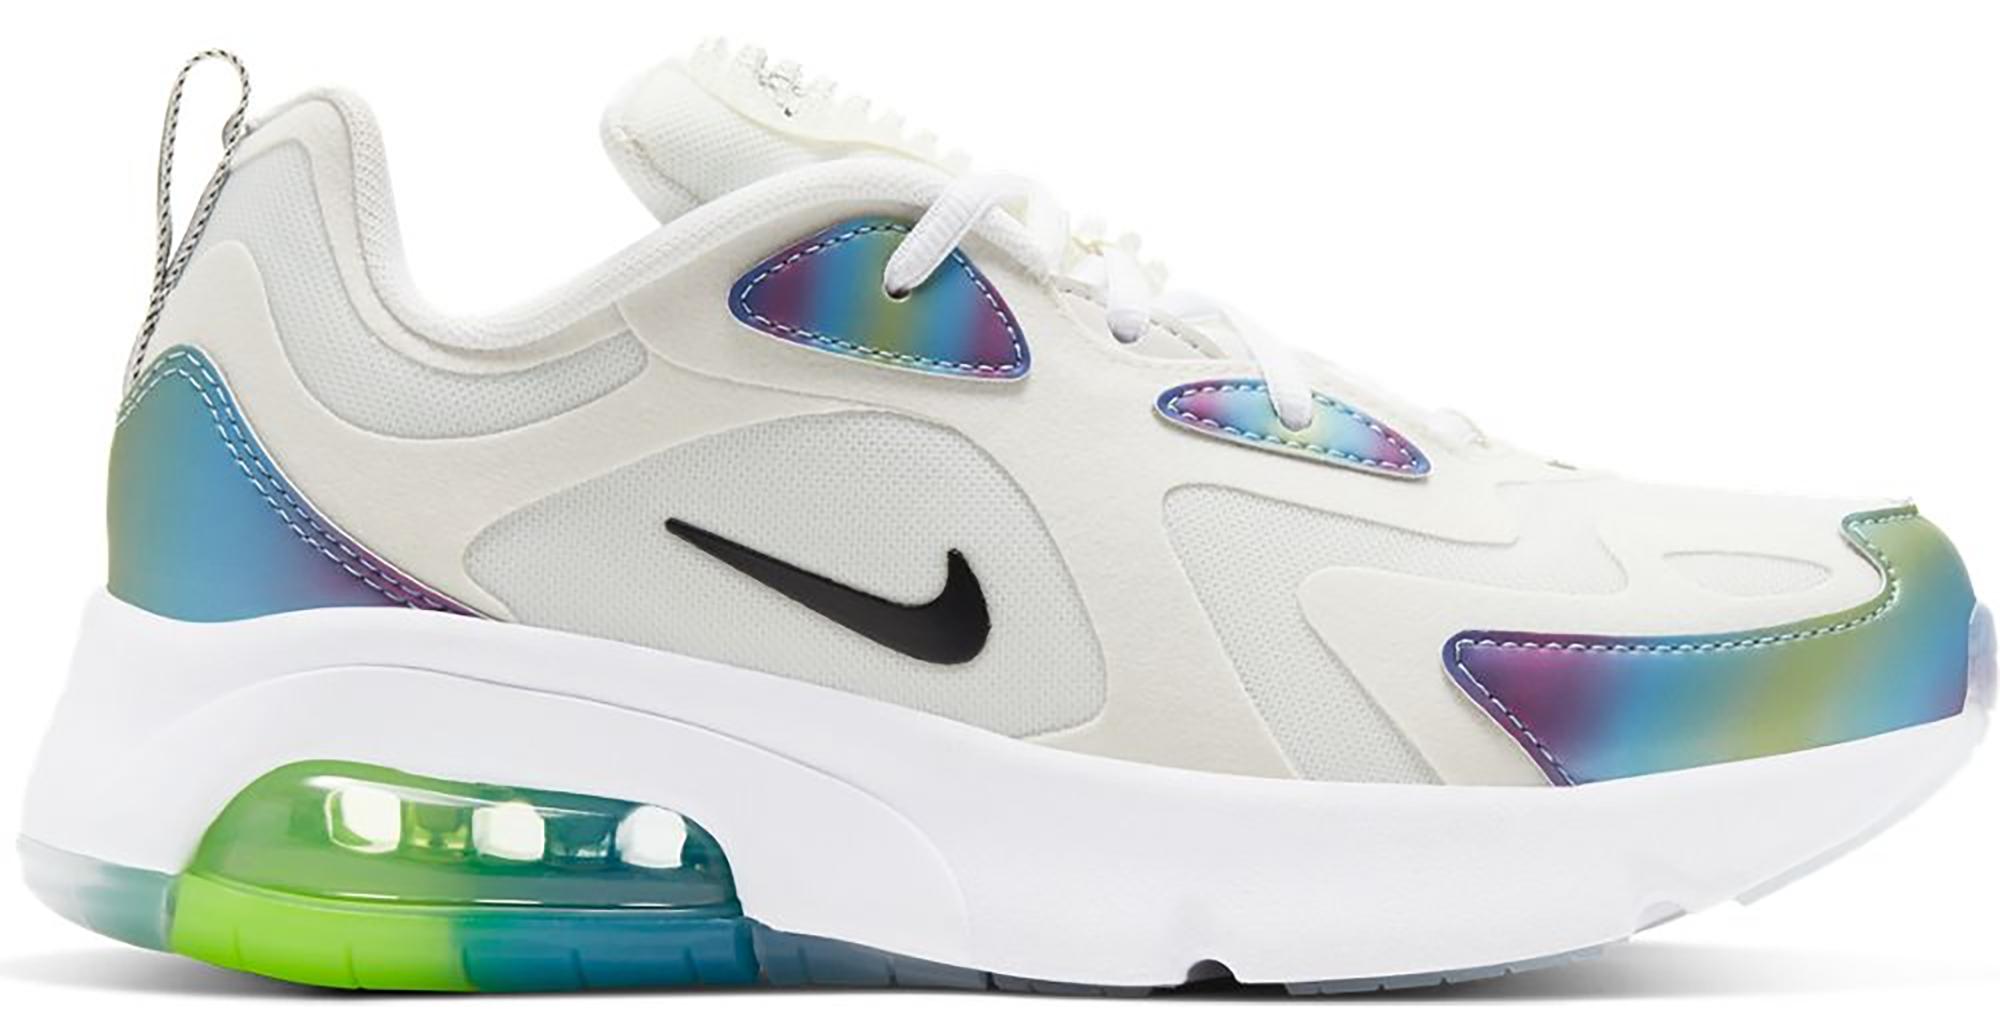 Nike Air Max 200 Bubble Pack White (GS)